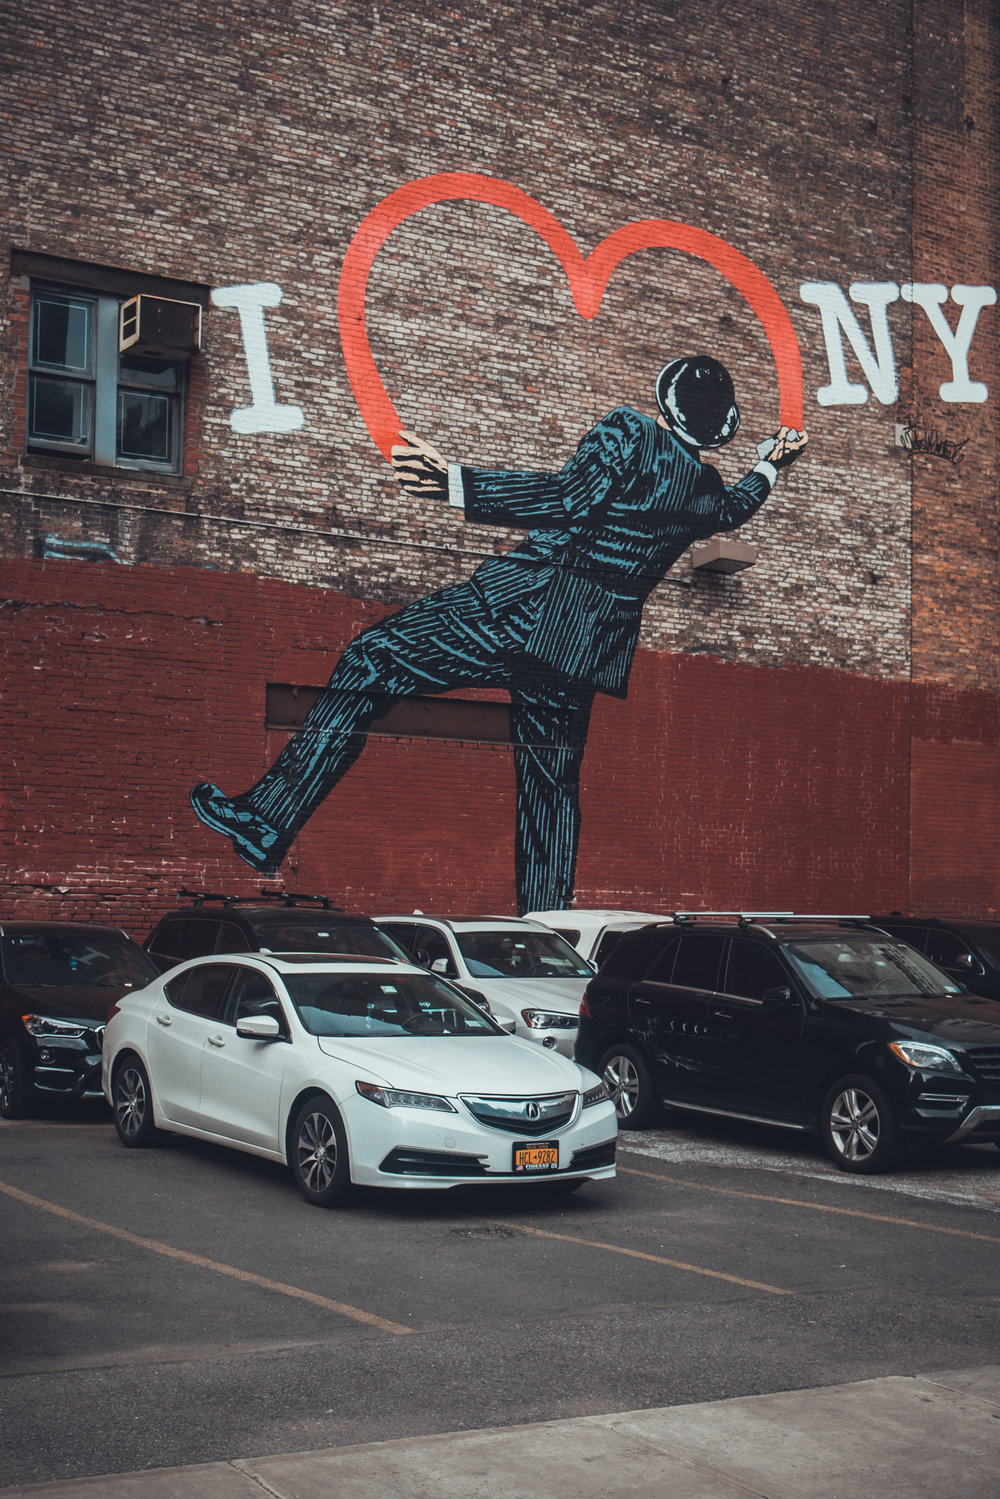 NYC_stijn_hoekstra-253.jpg